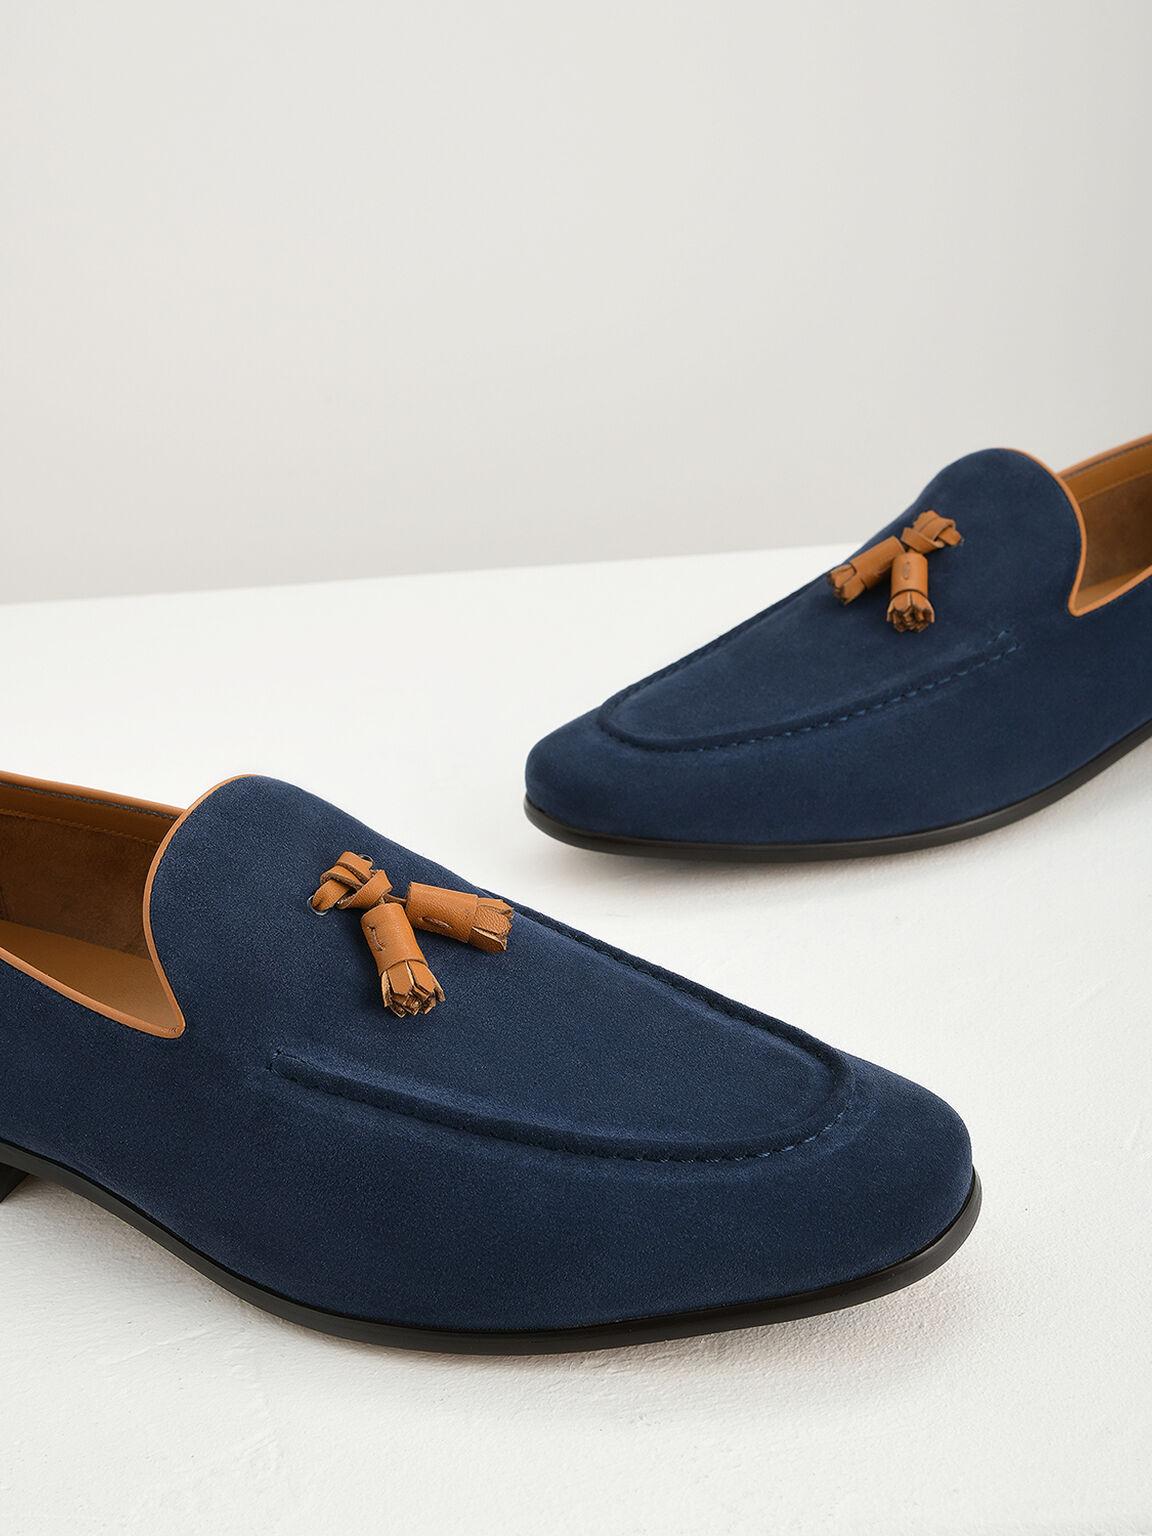 Suede Tasselled Loafers, Navy, hi-res